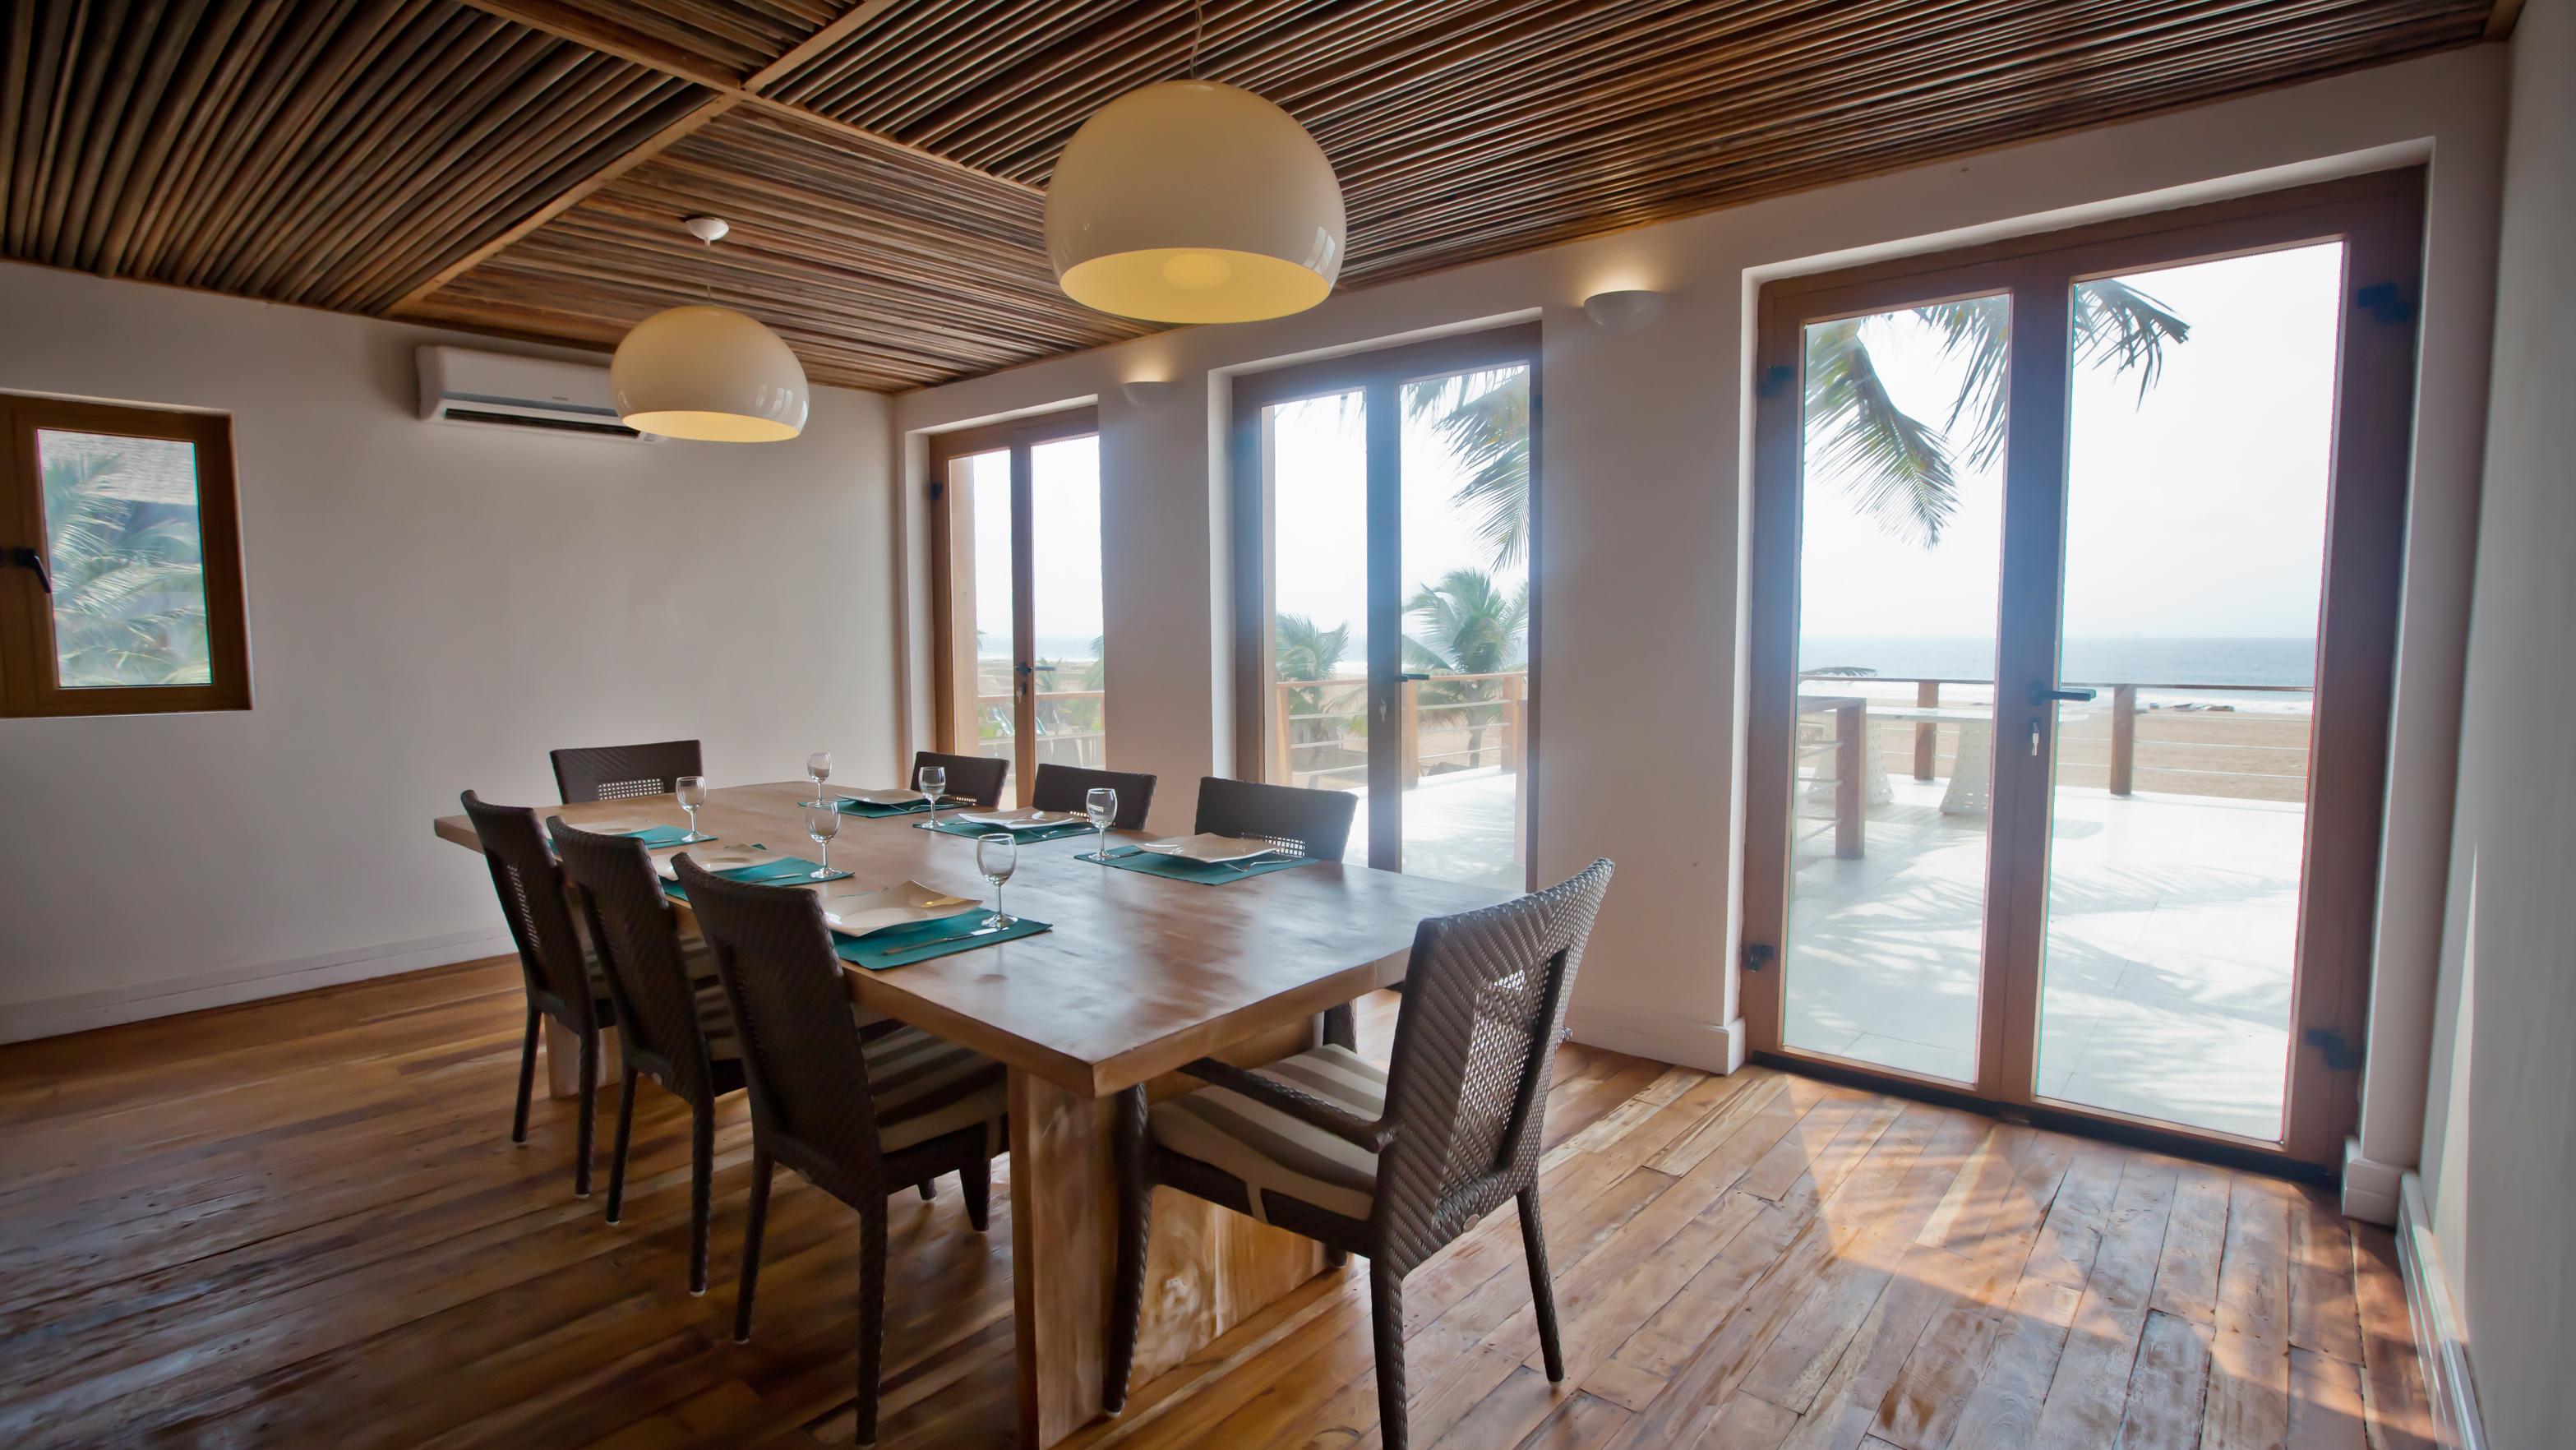 A Getaway By The Gulf Ilashe Beach House By Cmd A Livin